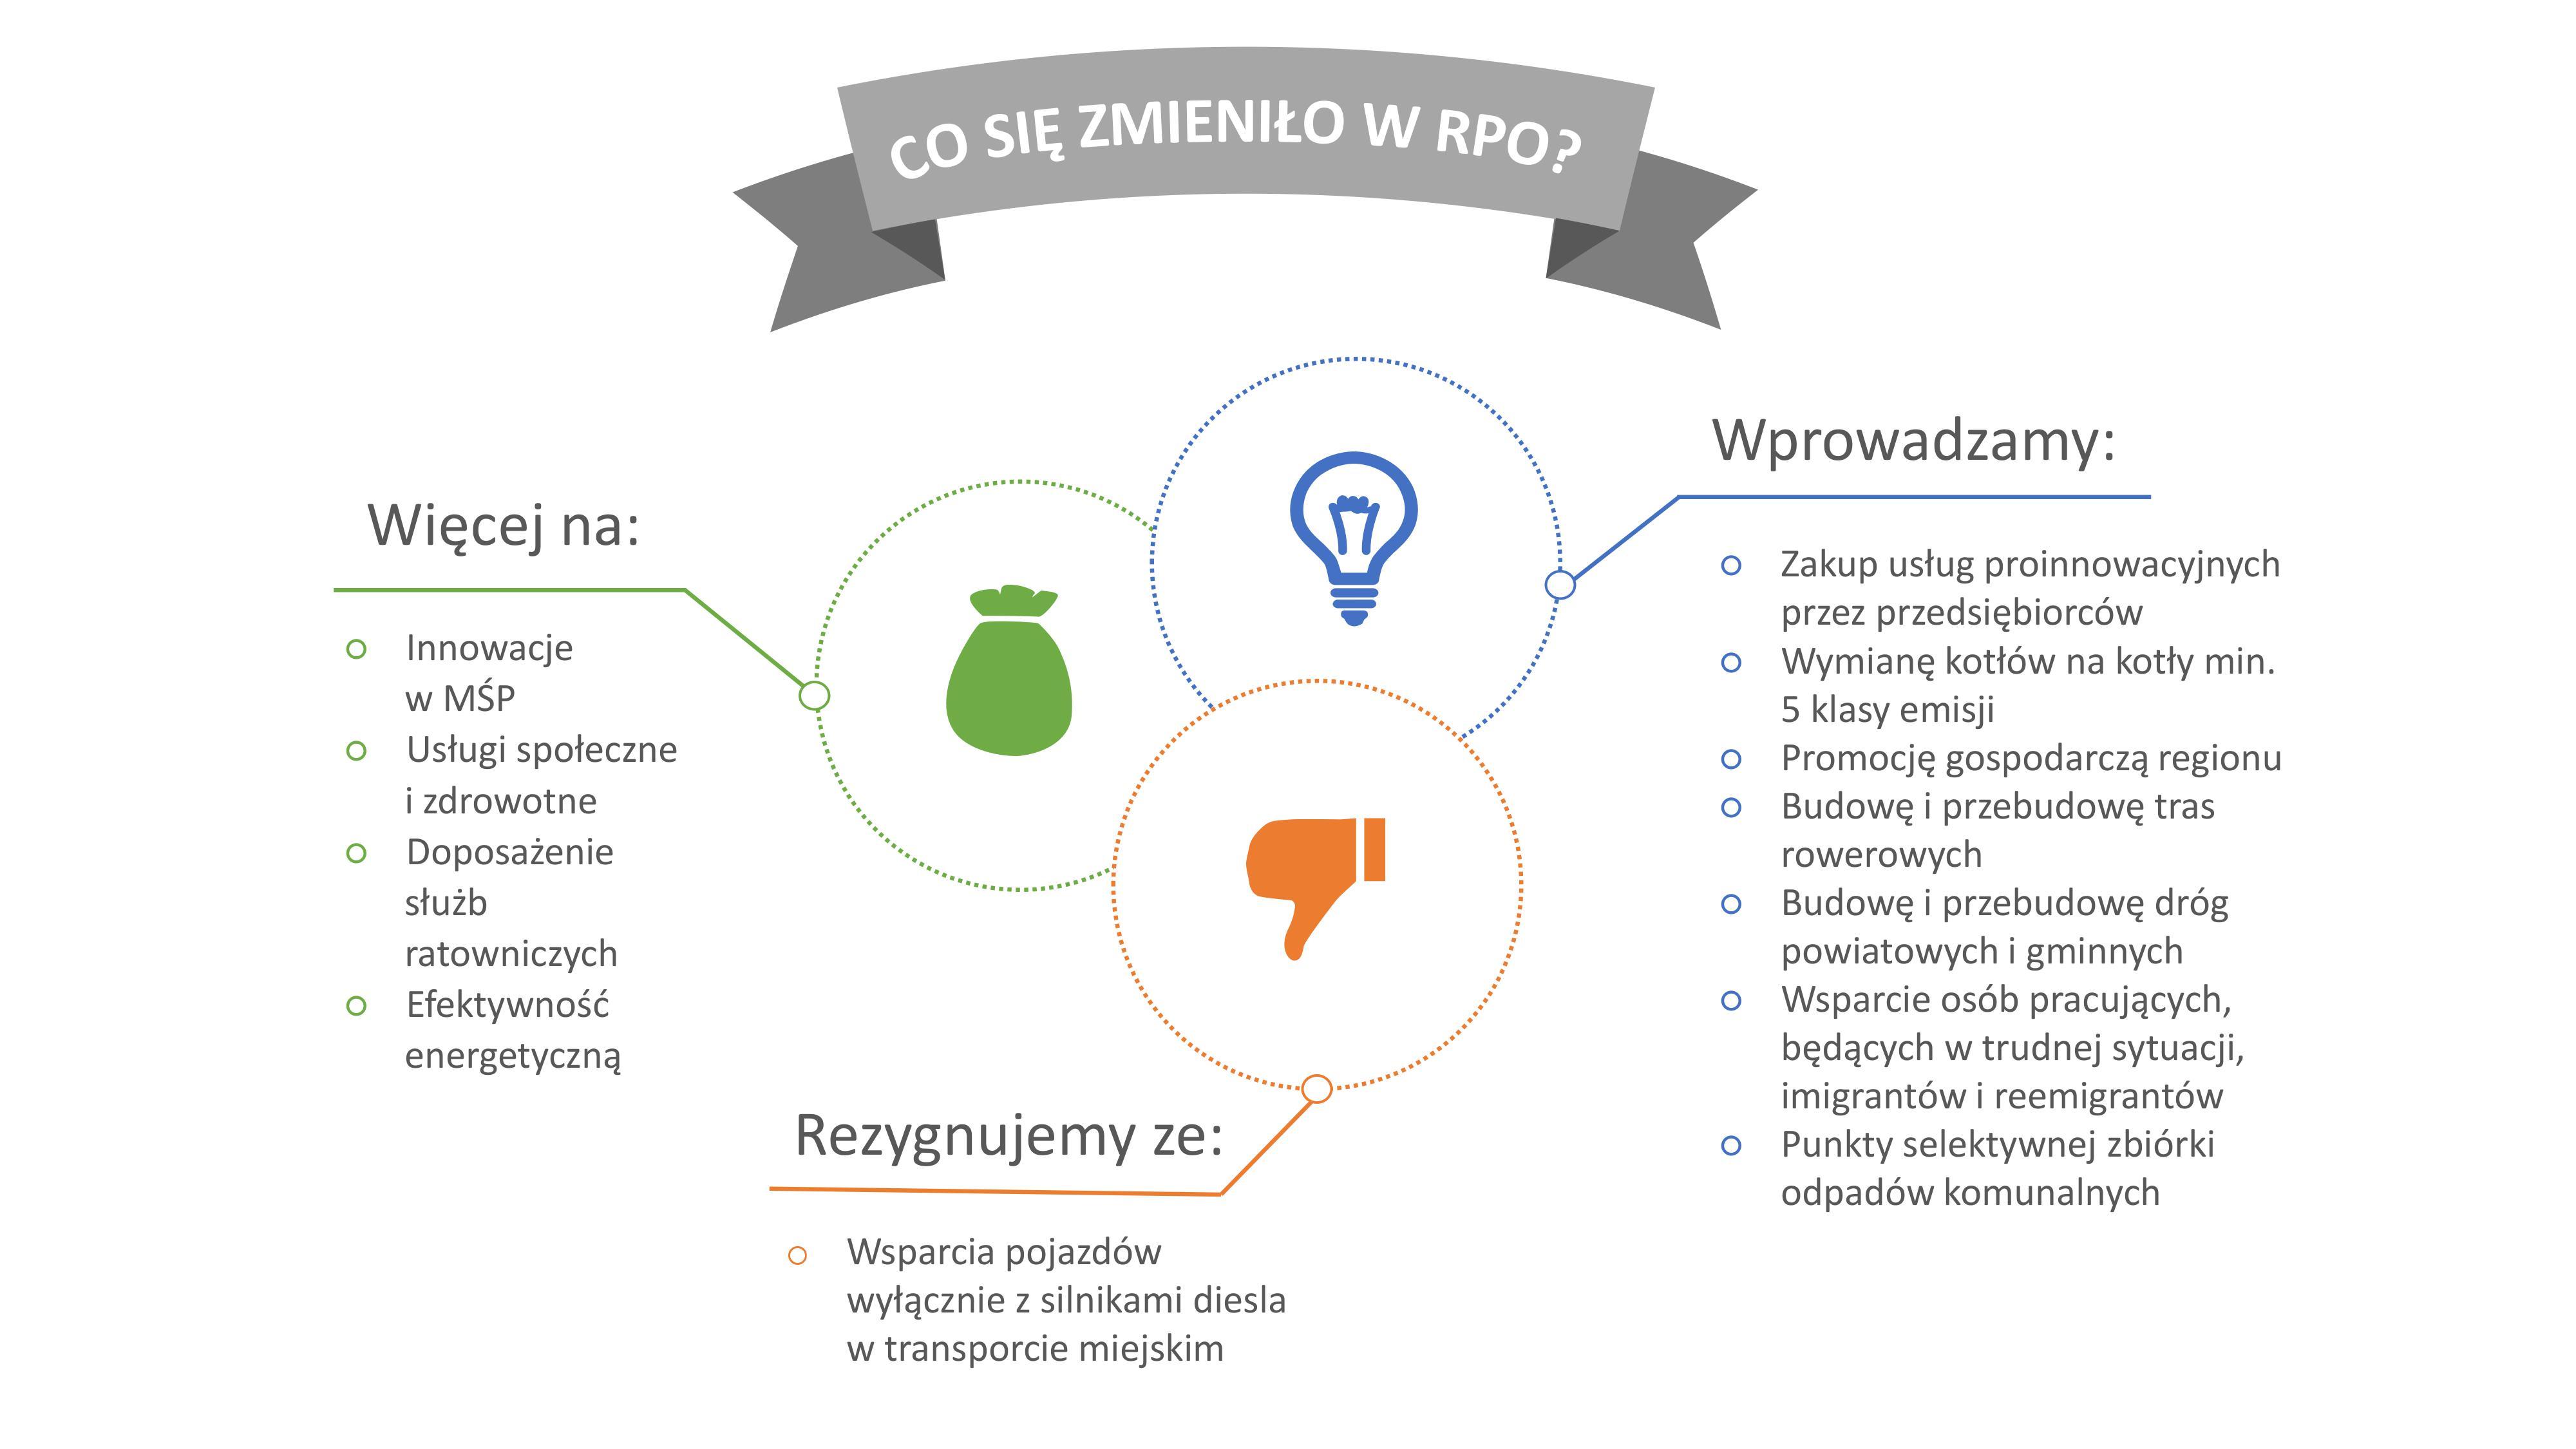 Plakaty Ulotki Foldery Rpo Wsl 2014 2020